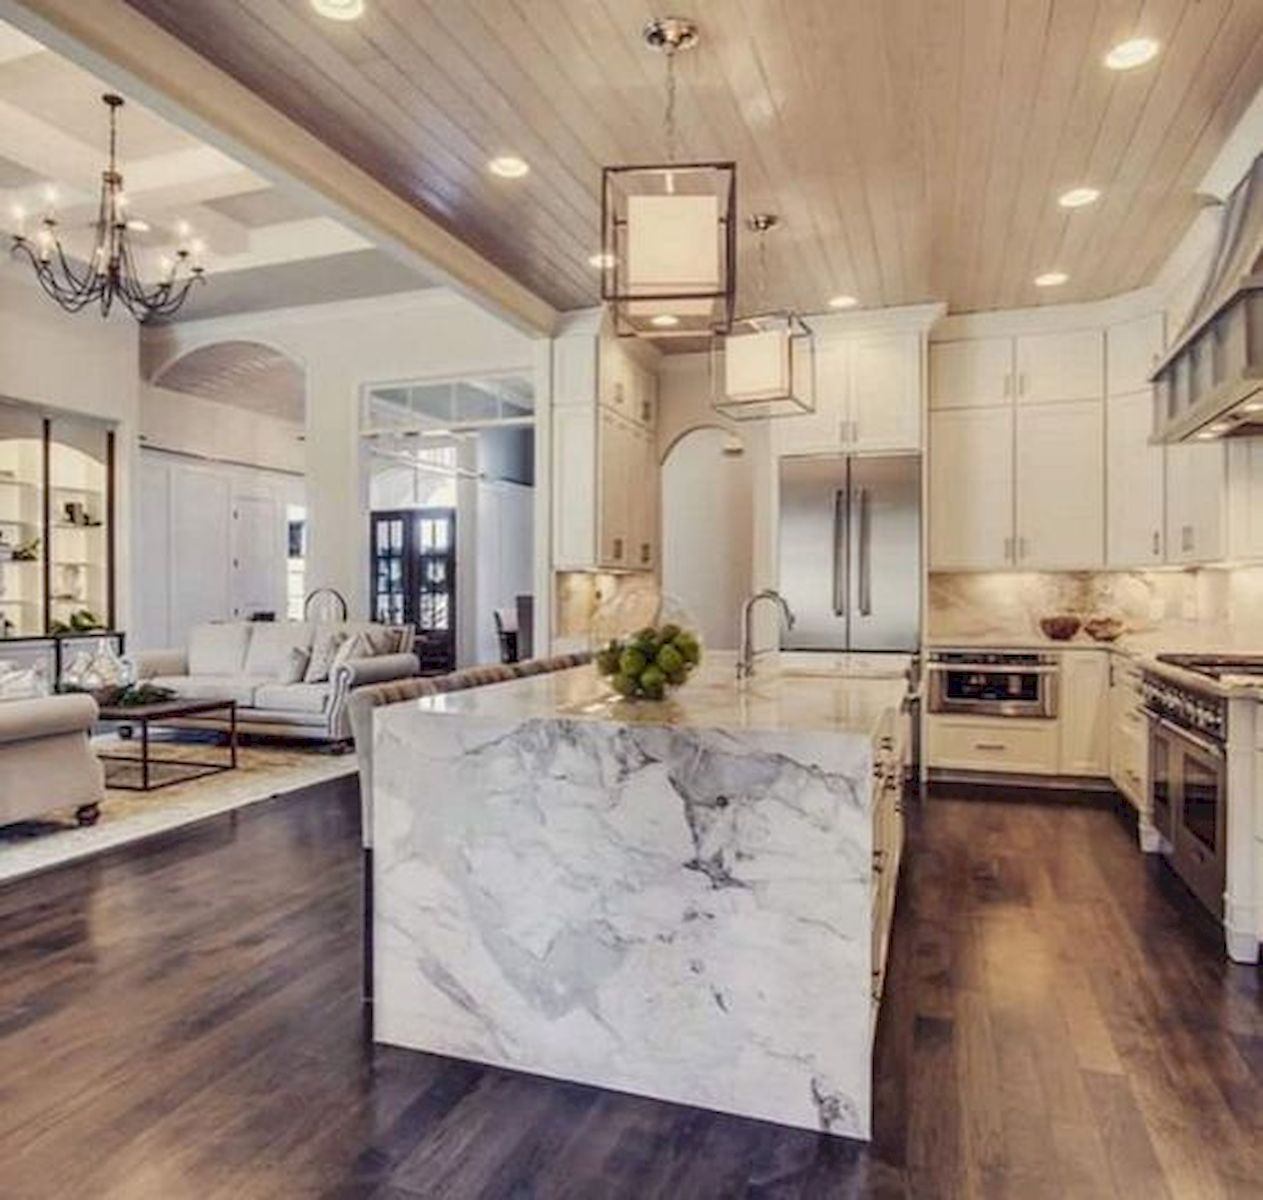 30 Best Kitchen Floor Tile Design Ideas With Concrete Floor Ideas (24)